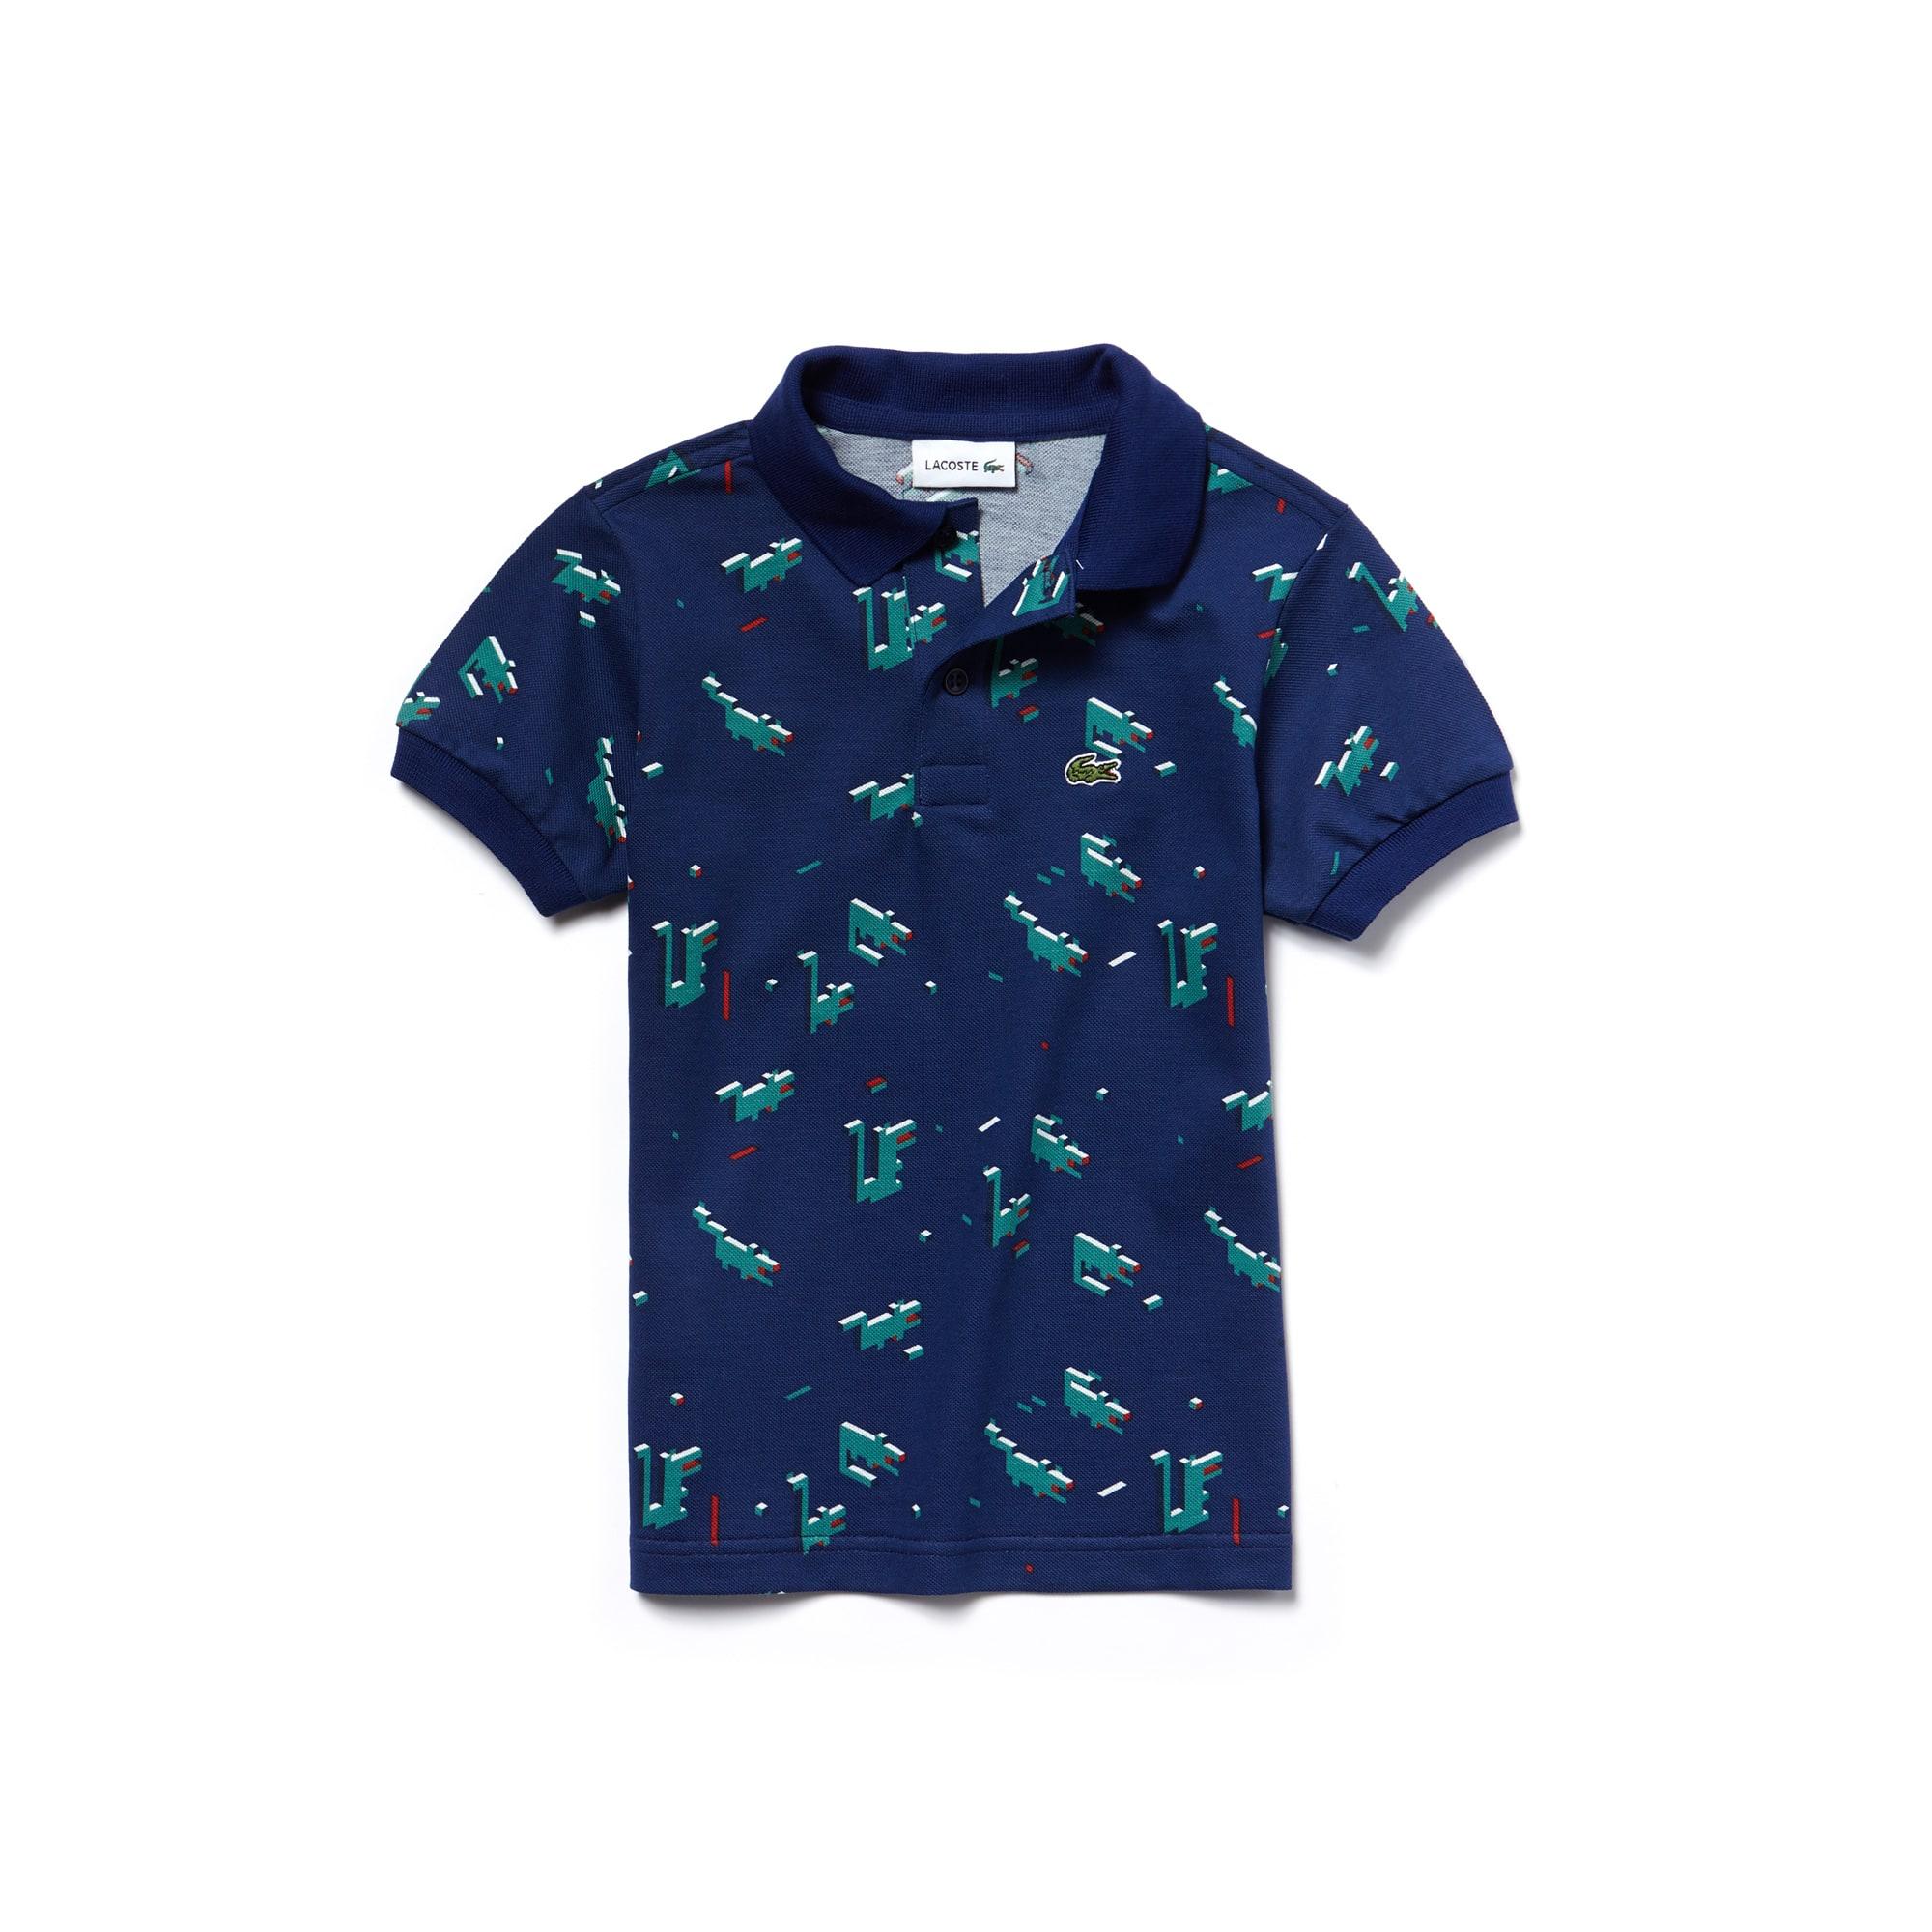 Boys' Lacoste Little Boy Edition Print Mini Piqué Polo